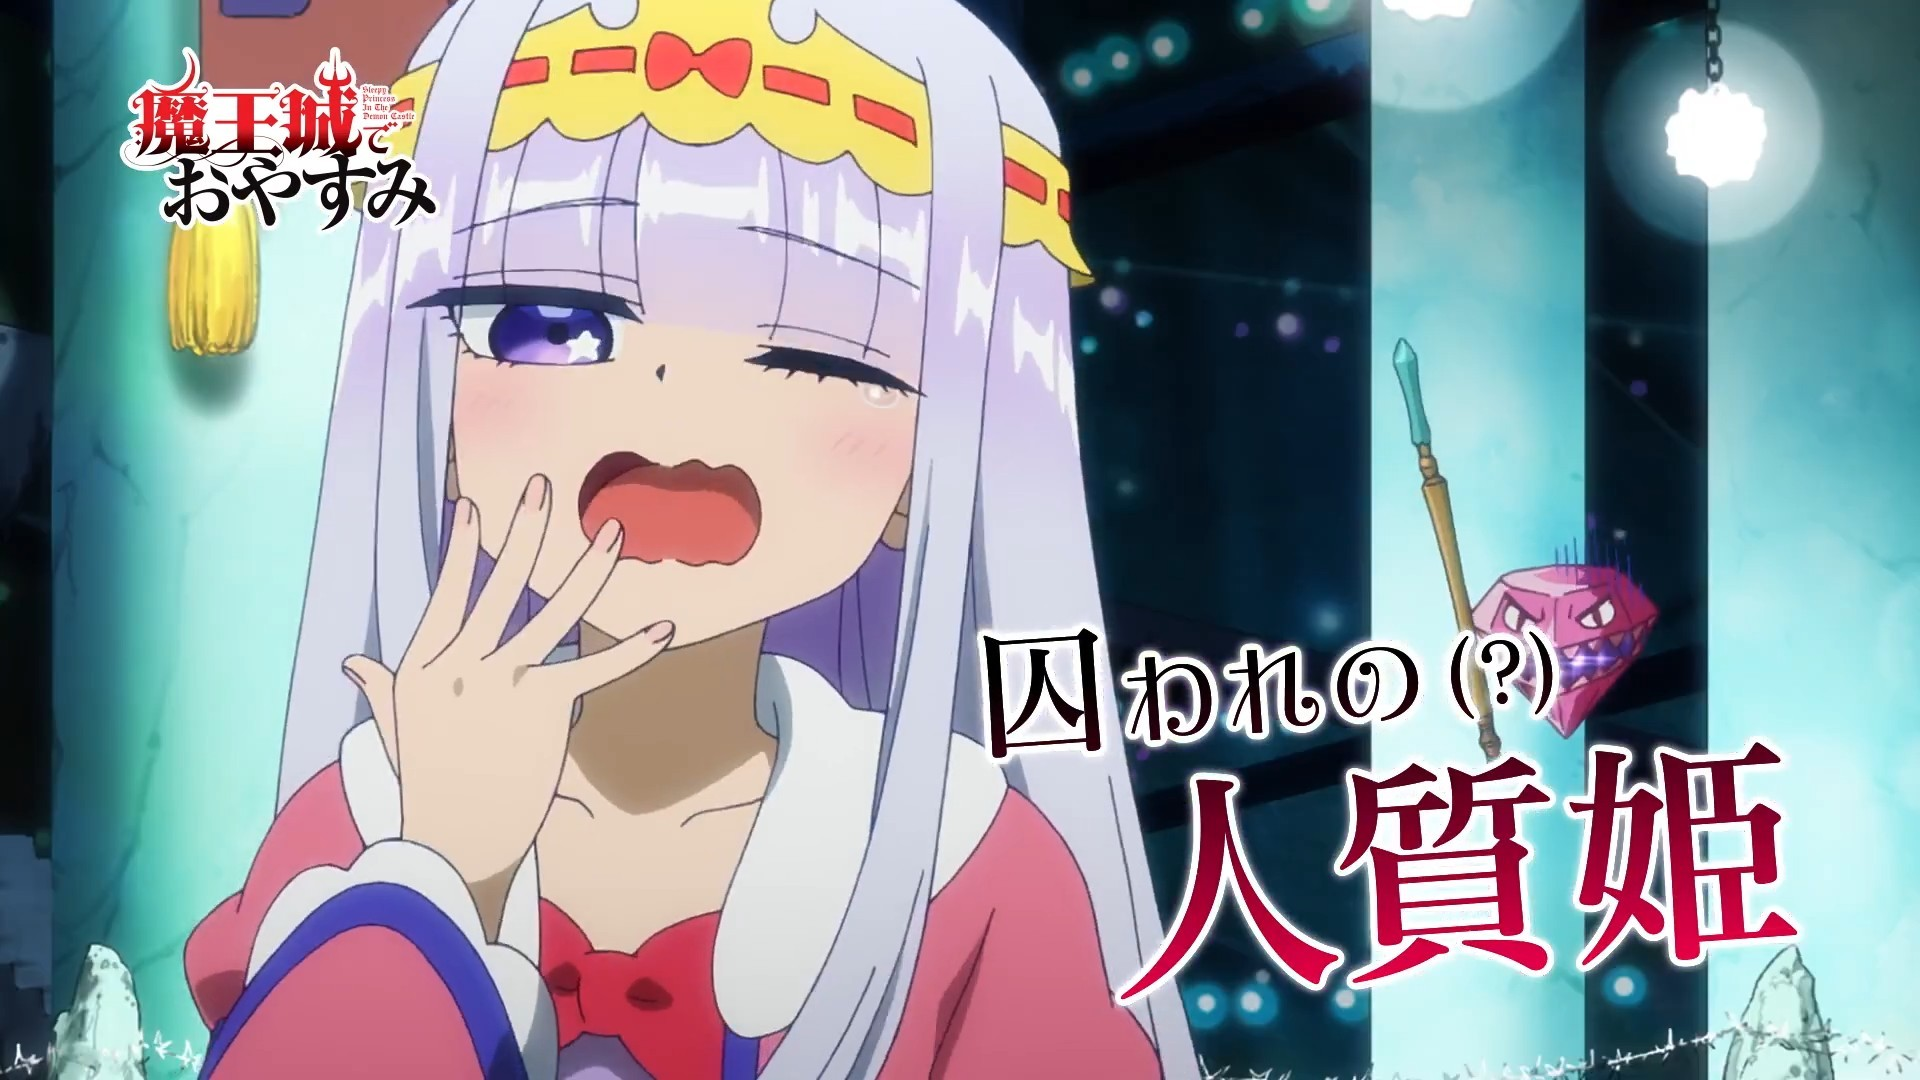 TV动画《在魔王城说晚安》第一弹PV公开,2020年10月开播